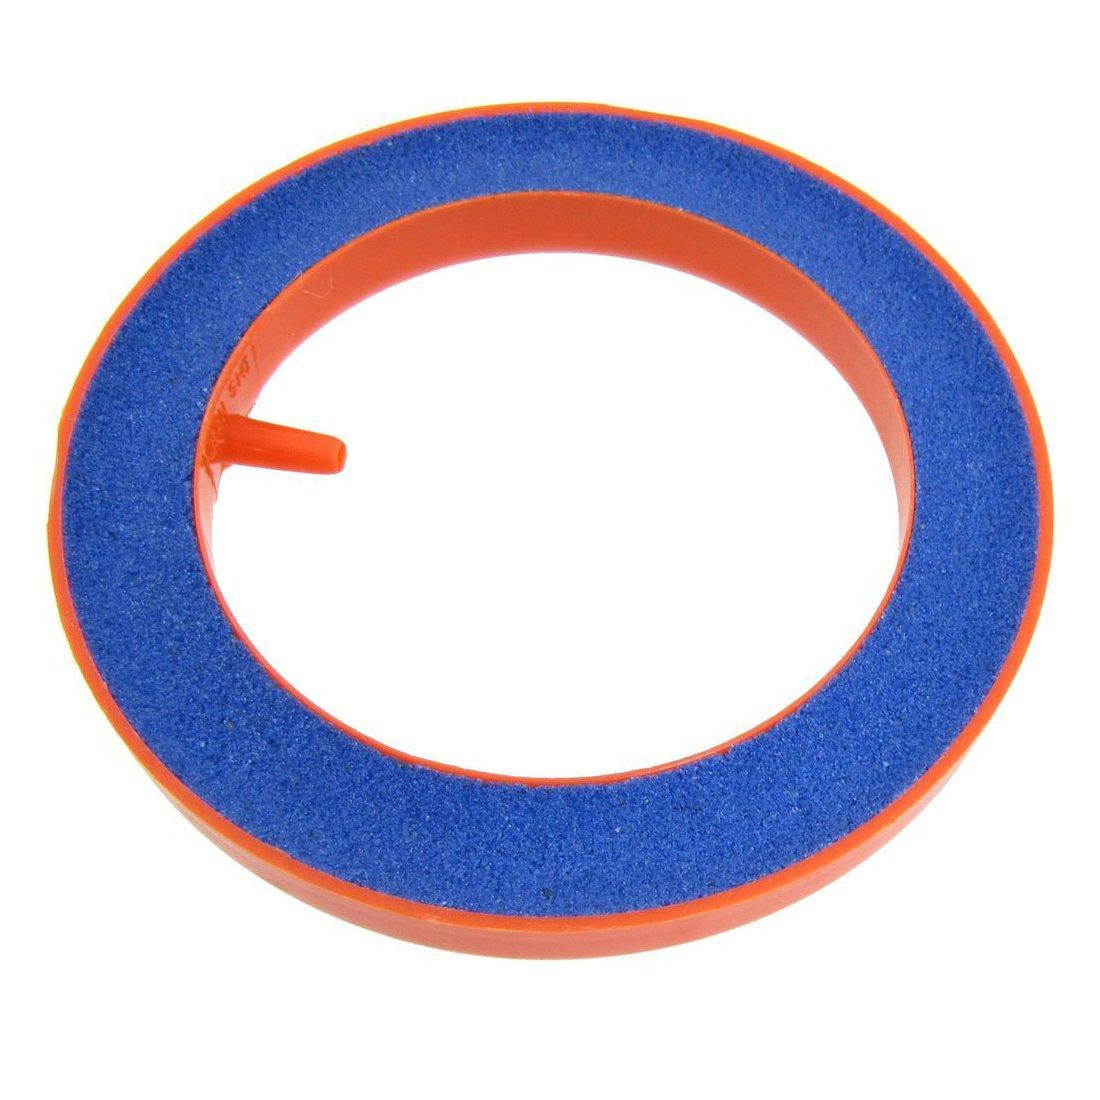 SODIAL Blue Round Mineral Bubble Aquarium Airstone 3.94 inch diameter